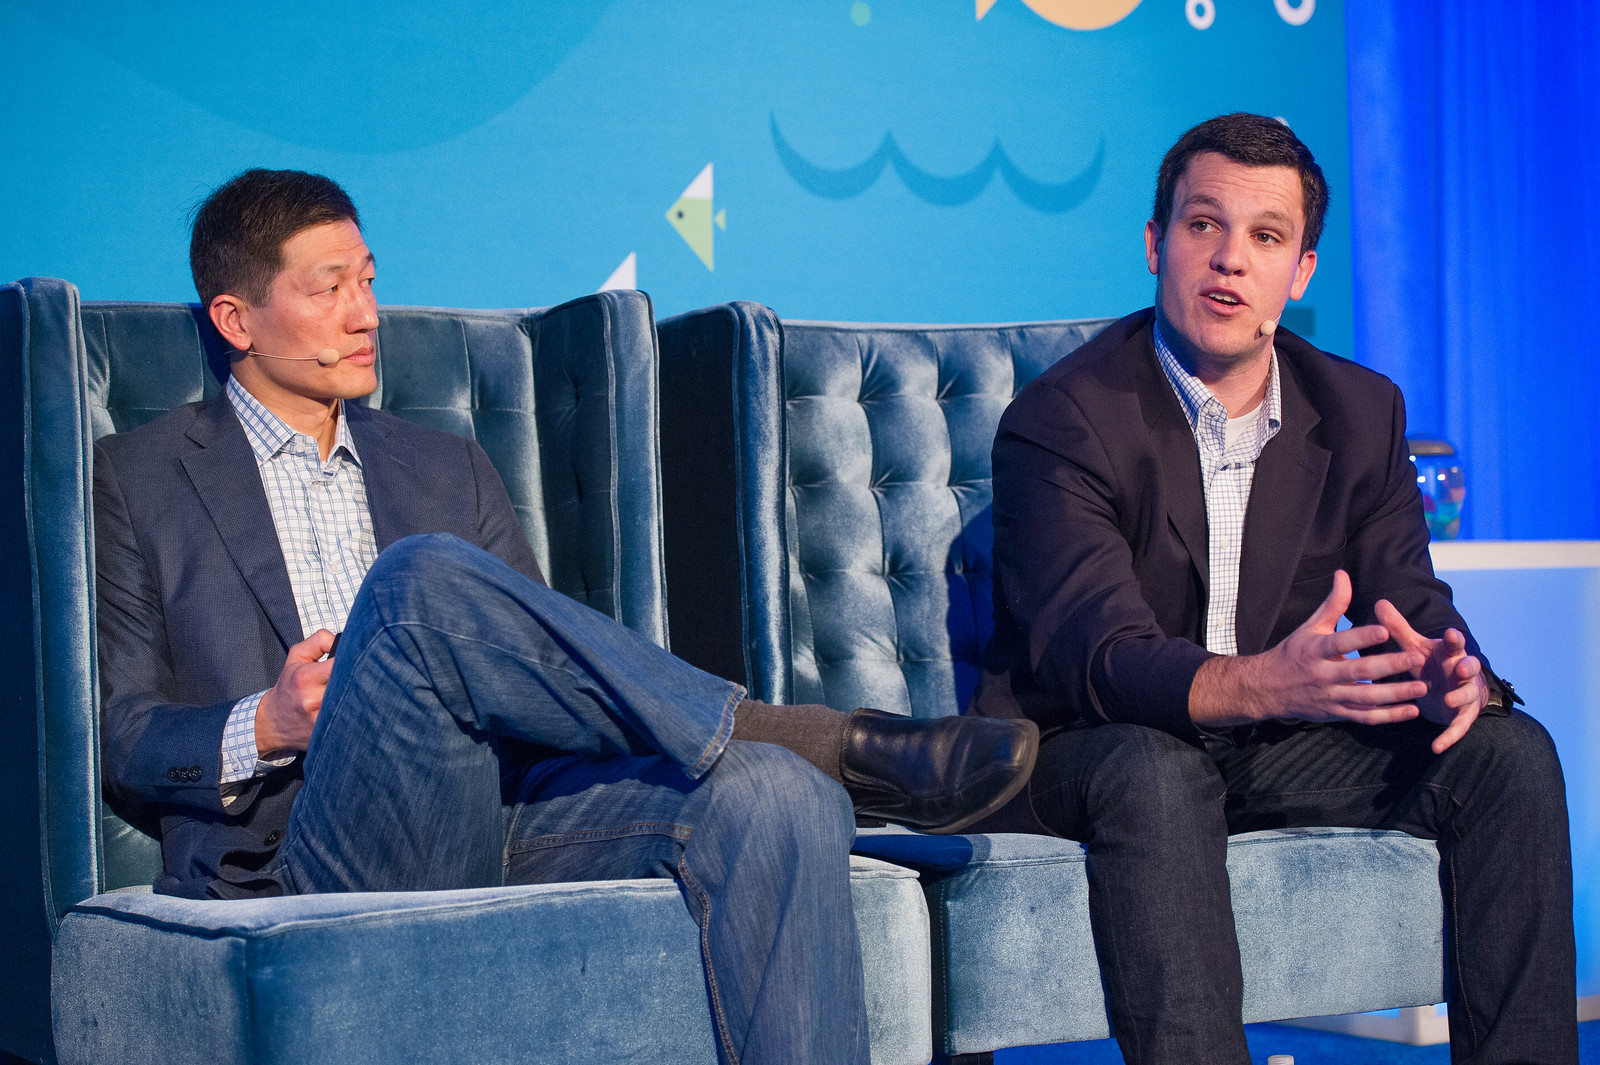 How 10 Million Freemium Users Built Our Enterprise Sales Karl Sun CEO / LUCID CHART  Dan Cook VP SALES / LUCID CHART